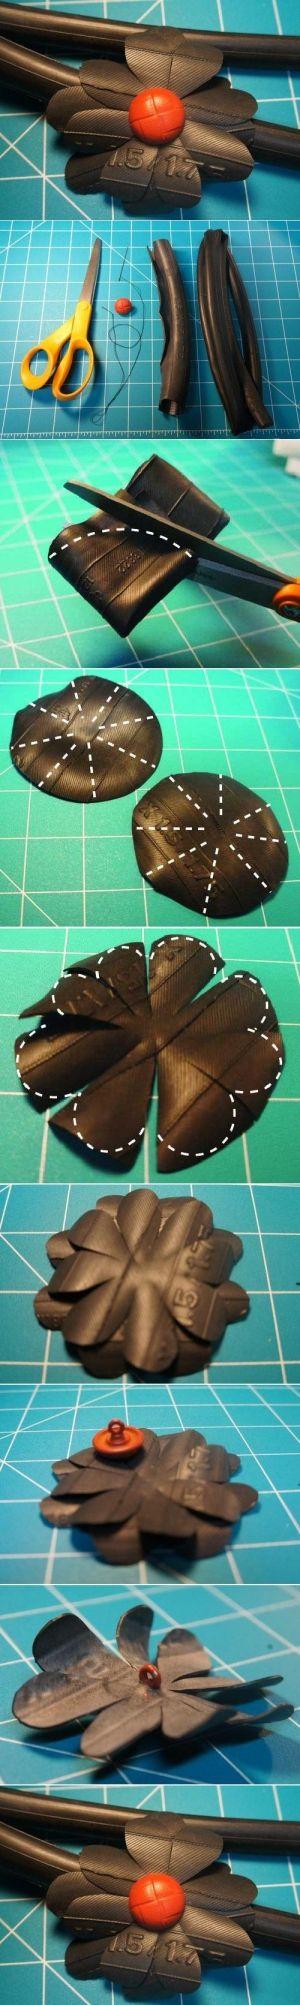 DIY Rubber Tire Flower DIY Rubber Tire Flower by diyforever